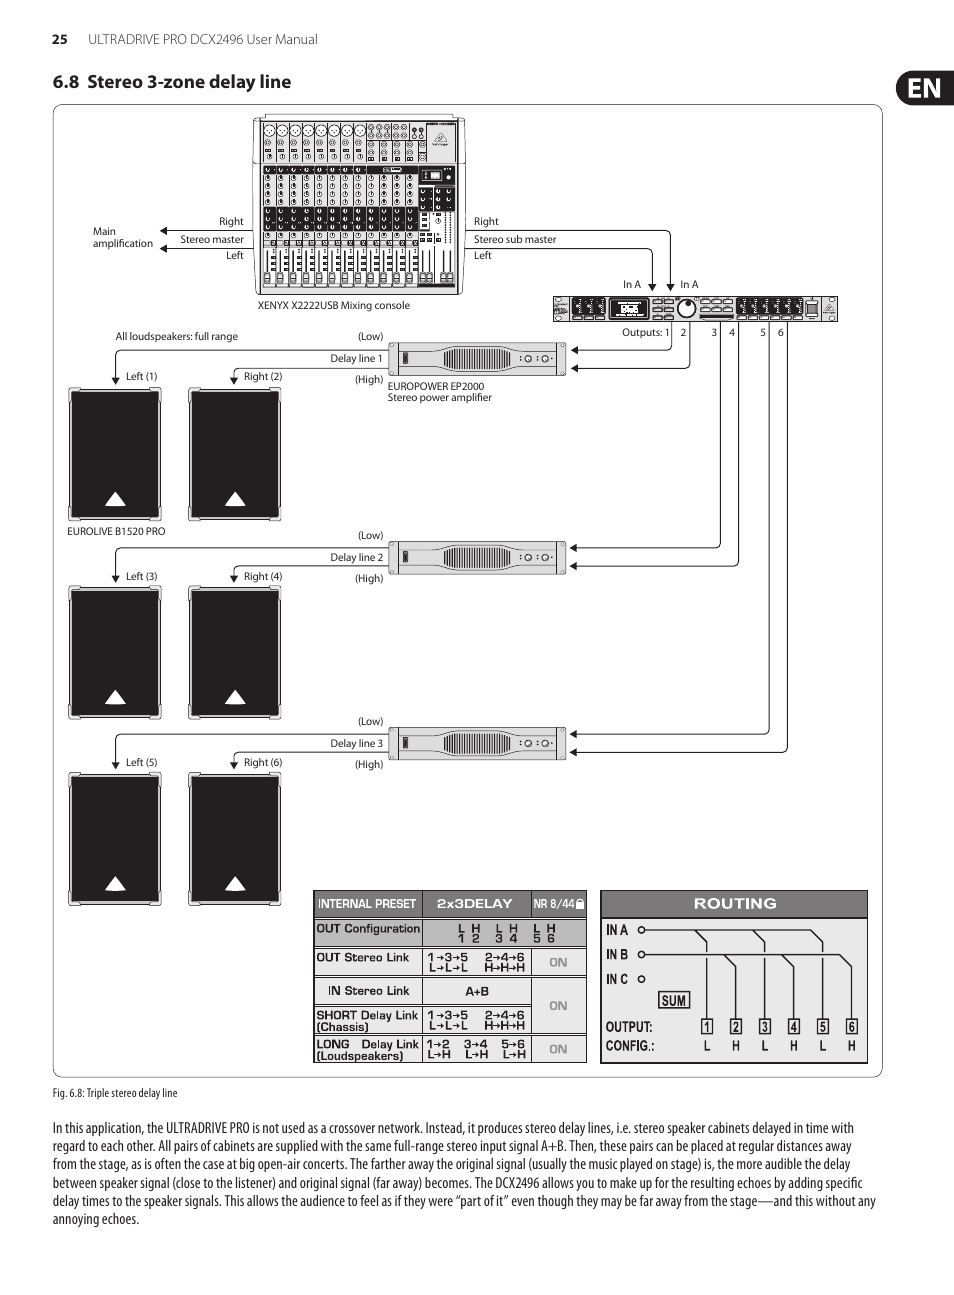 8 stereo 3 zone delay line behringer ultradrive pro dcx2496 user rh manualsdir com Behringer 2496 Manual Behringer 2496 Manual